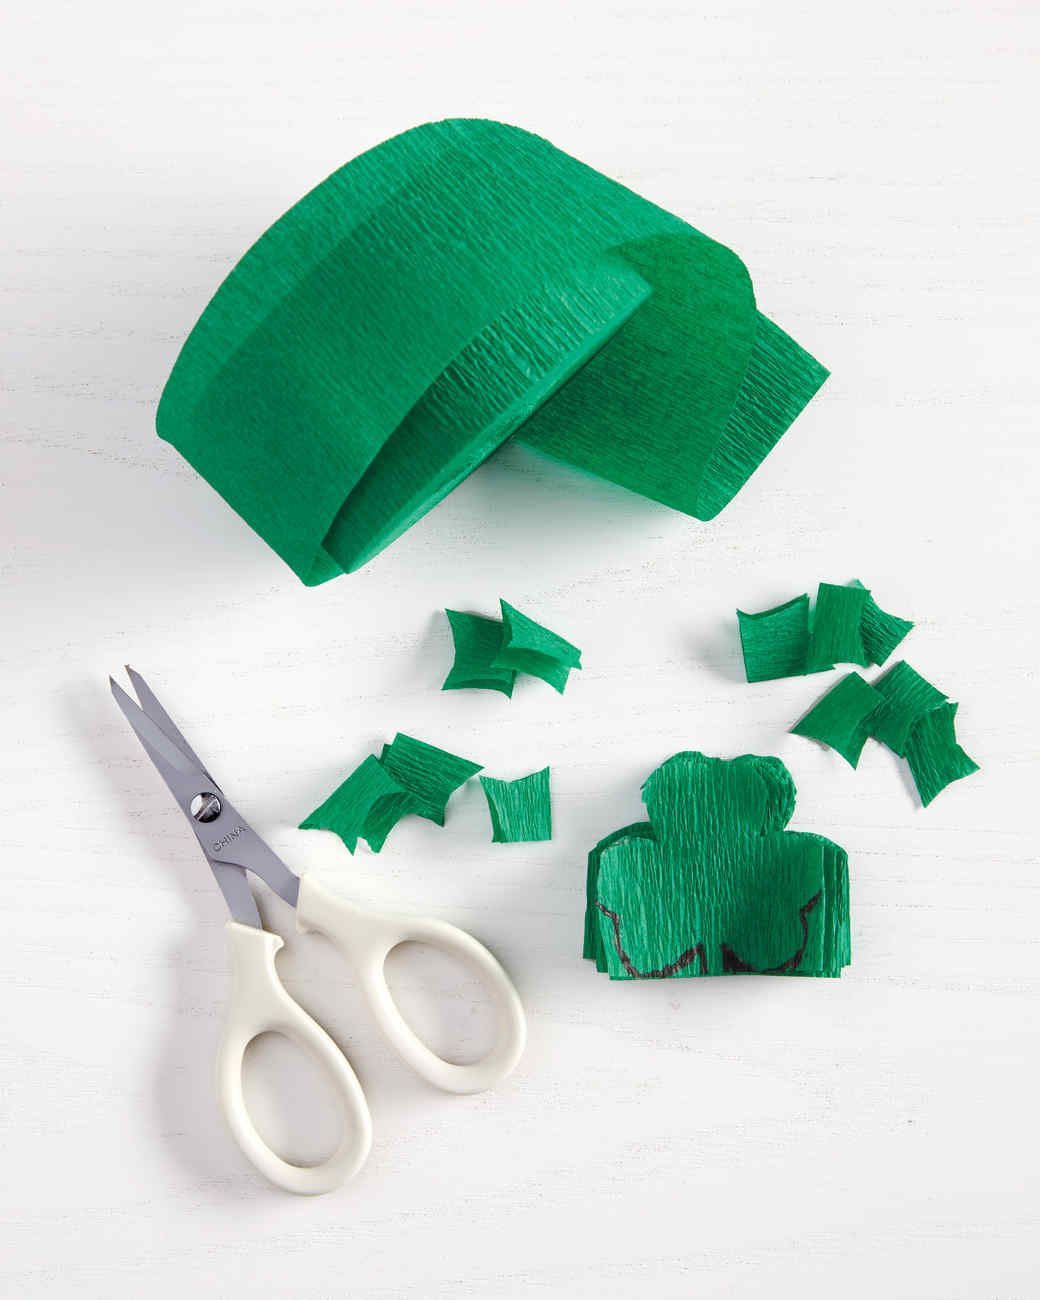 crafts-shamrockhowto2-006-mld110777.jpg